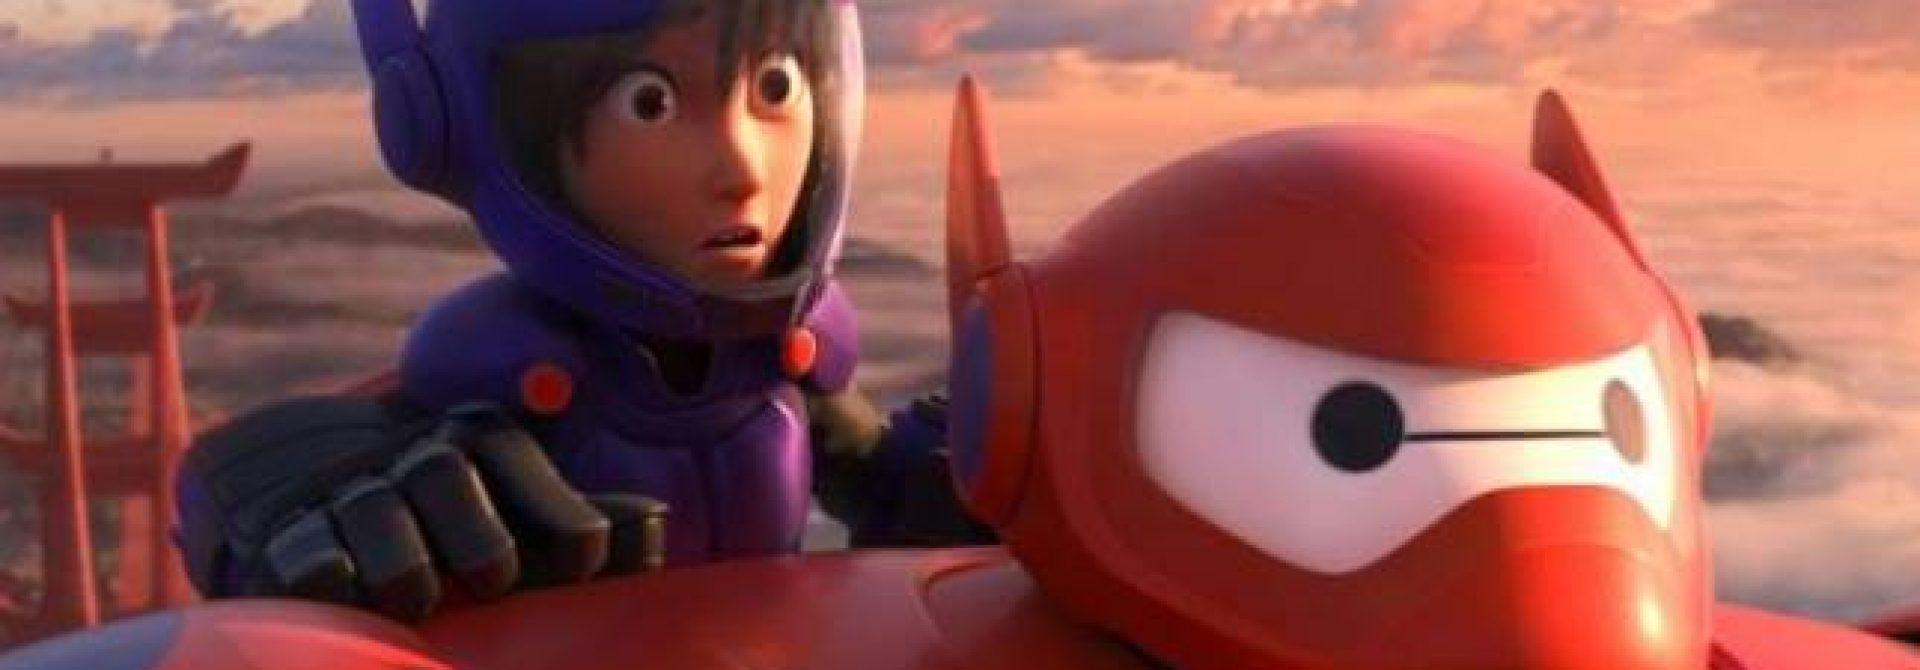 Big Hero 6 TV Series Coming to Disney XD Next Year